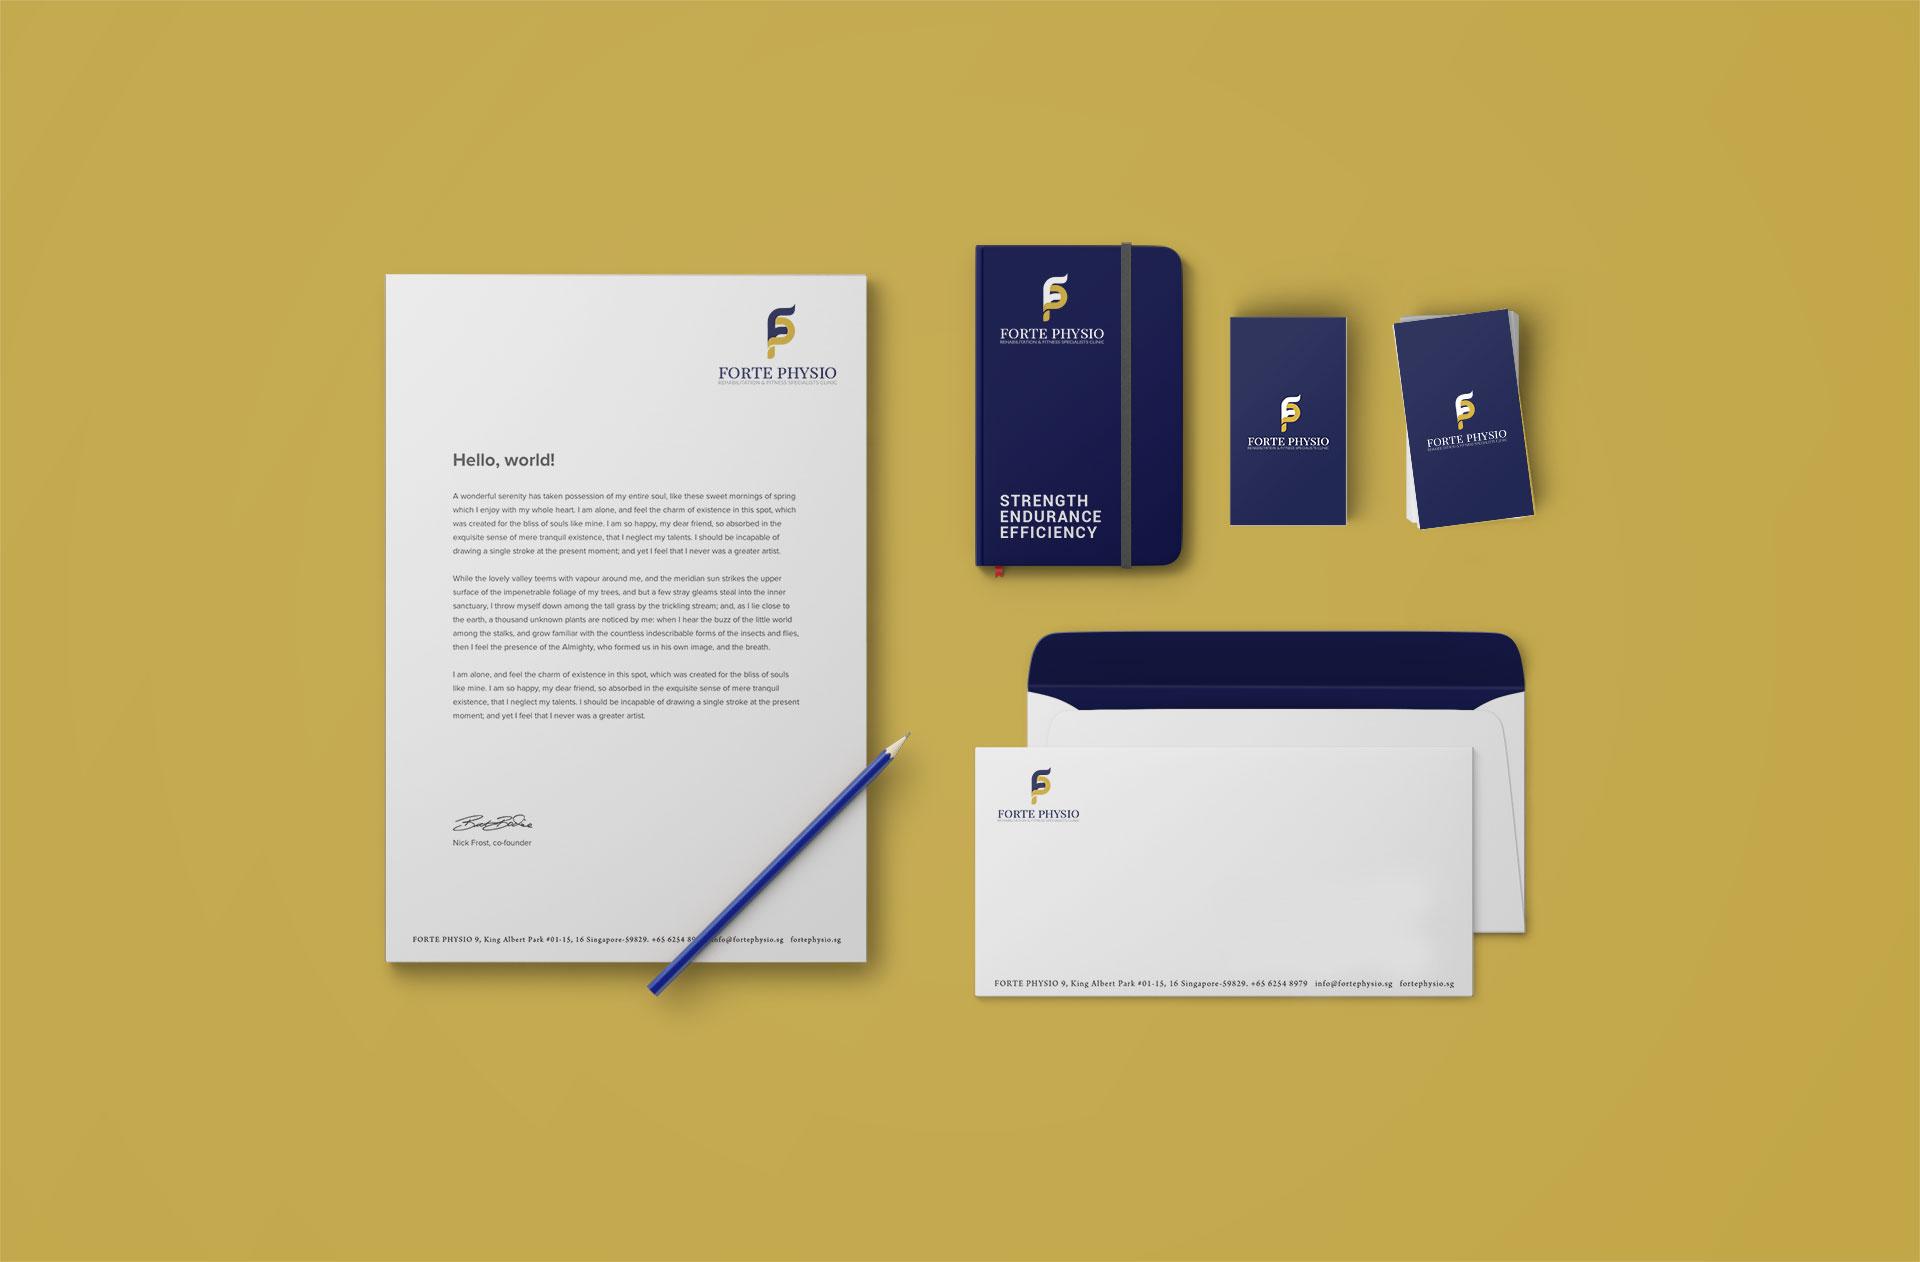 Forte Physio Branding